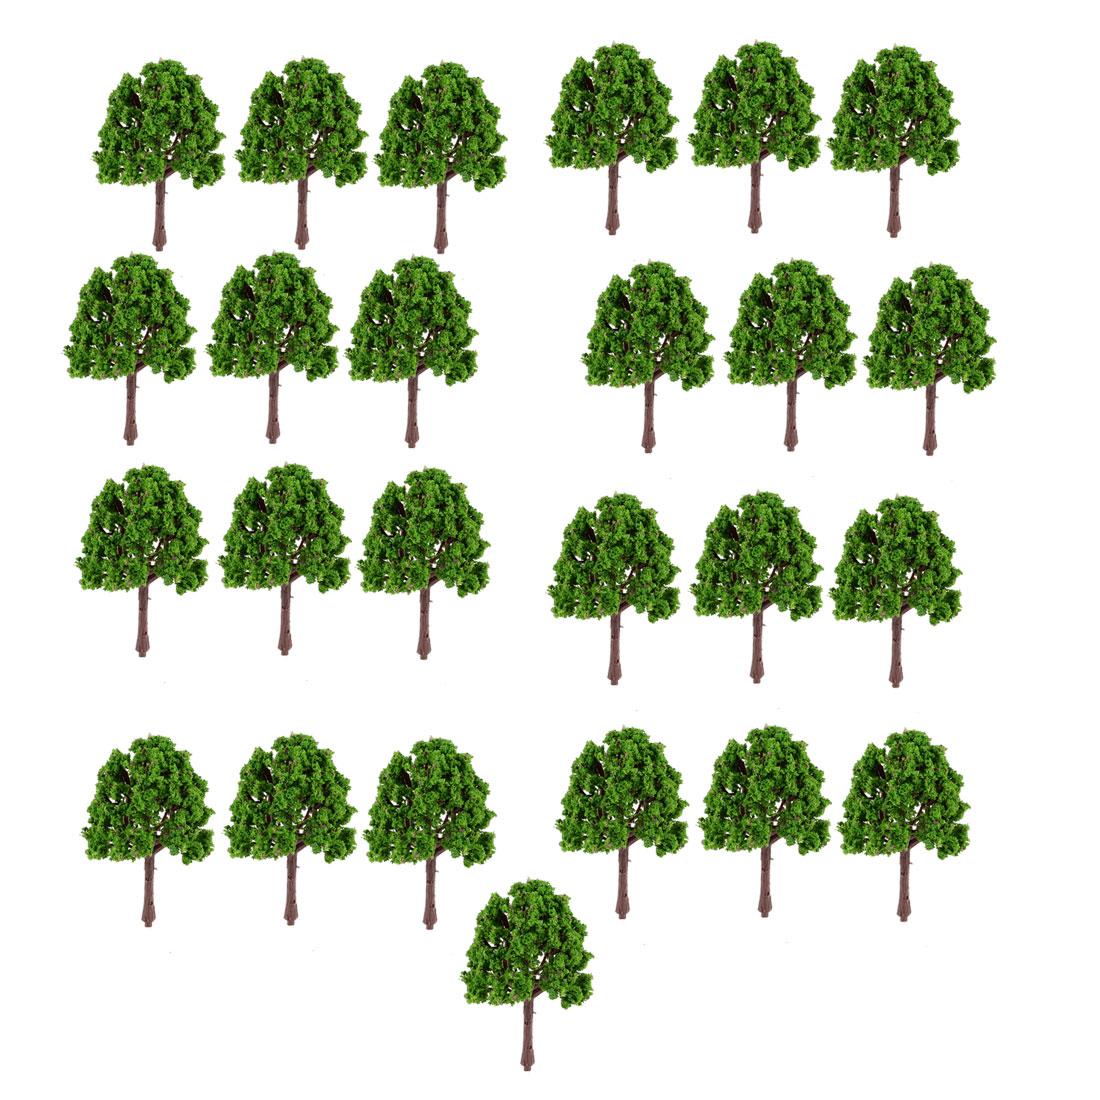 25 Pcs Ornamenet Artificial Plastic Green Leaves Tree 7.5cm High 1:150